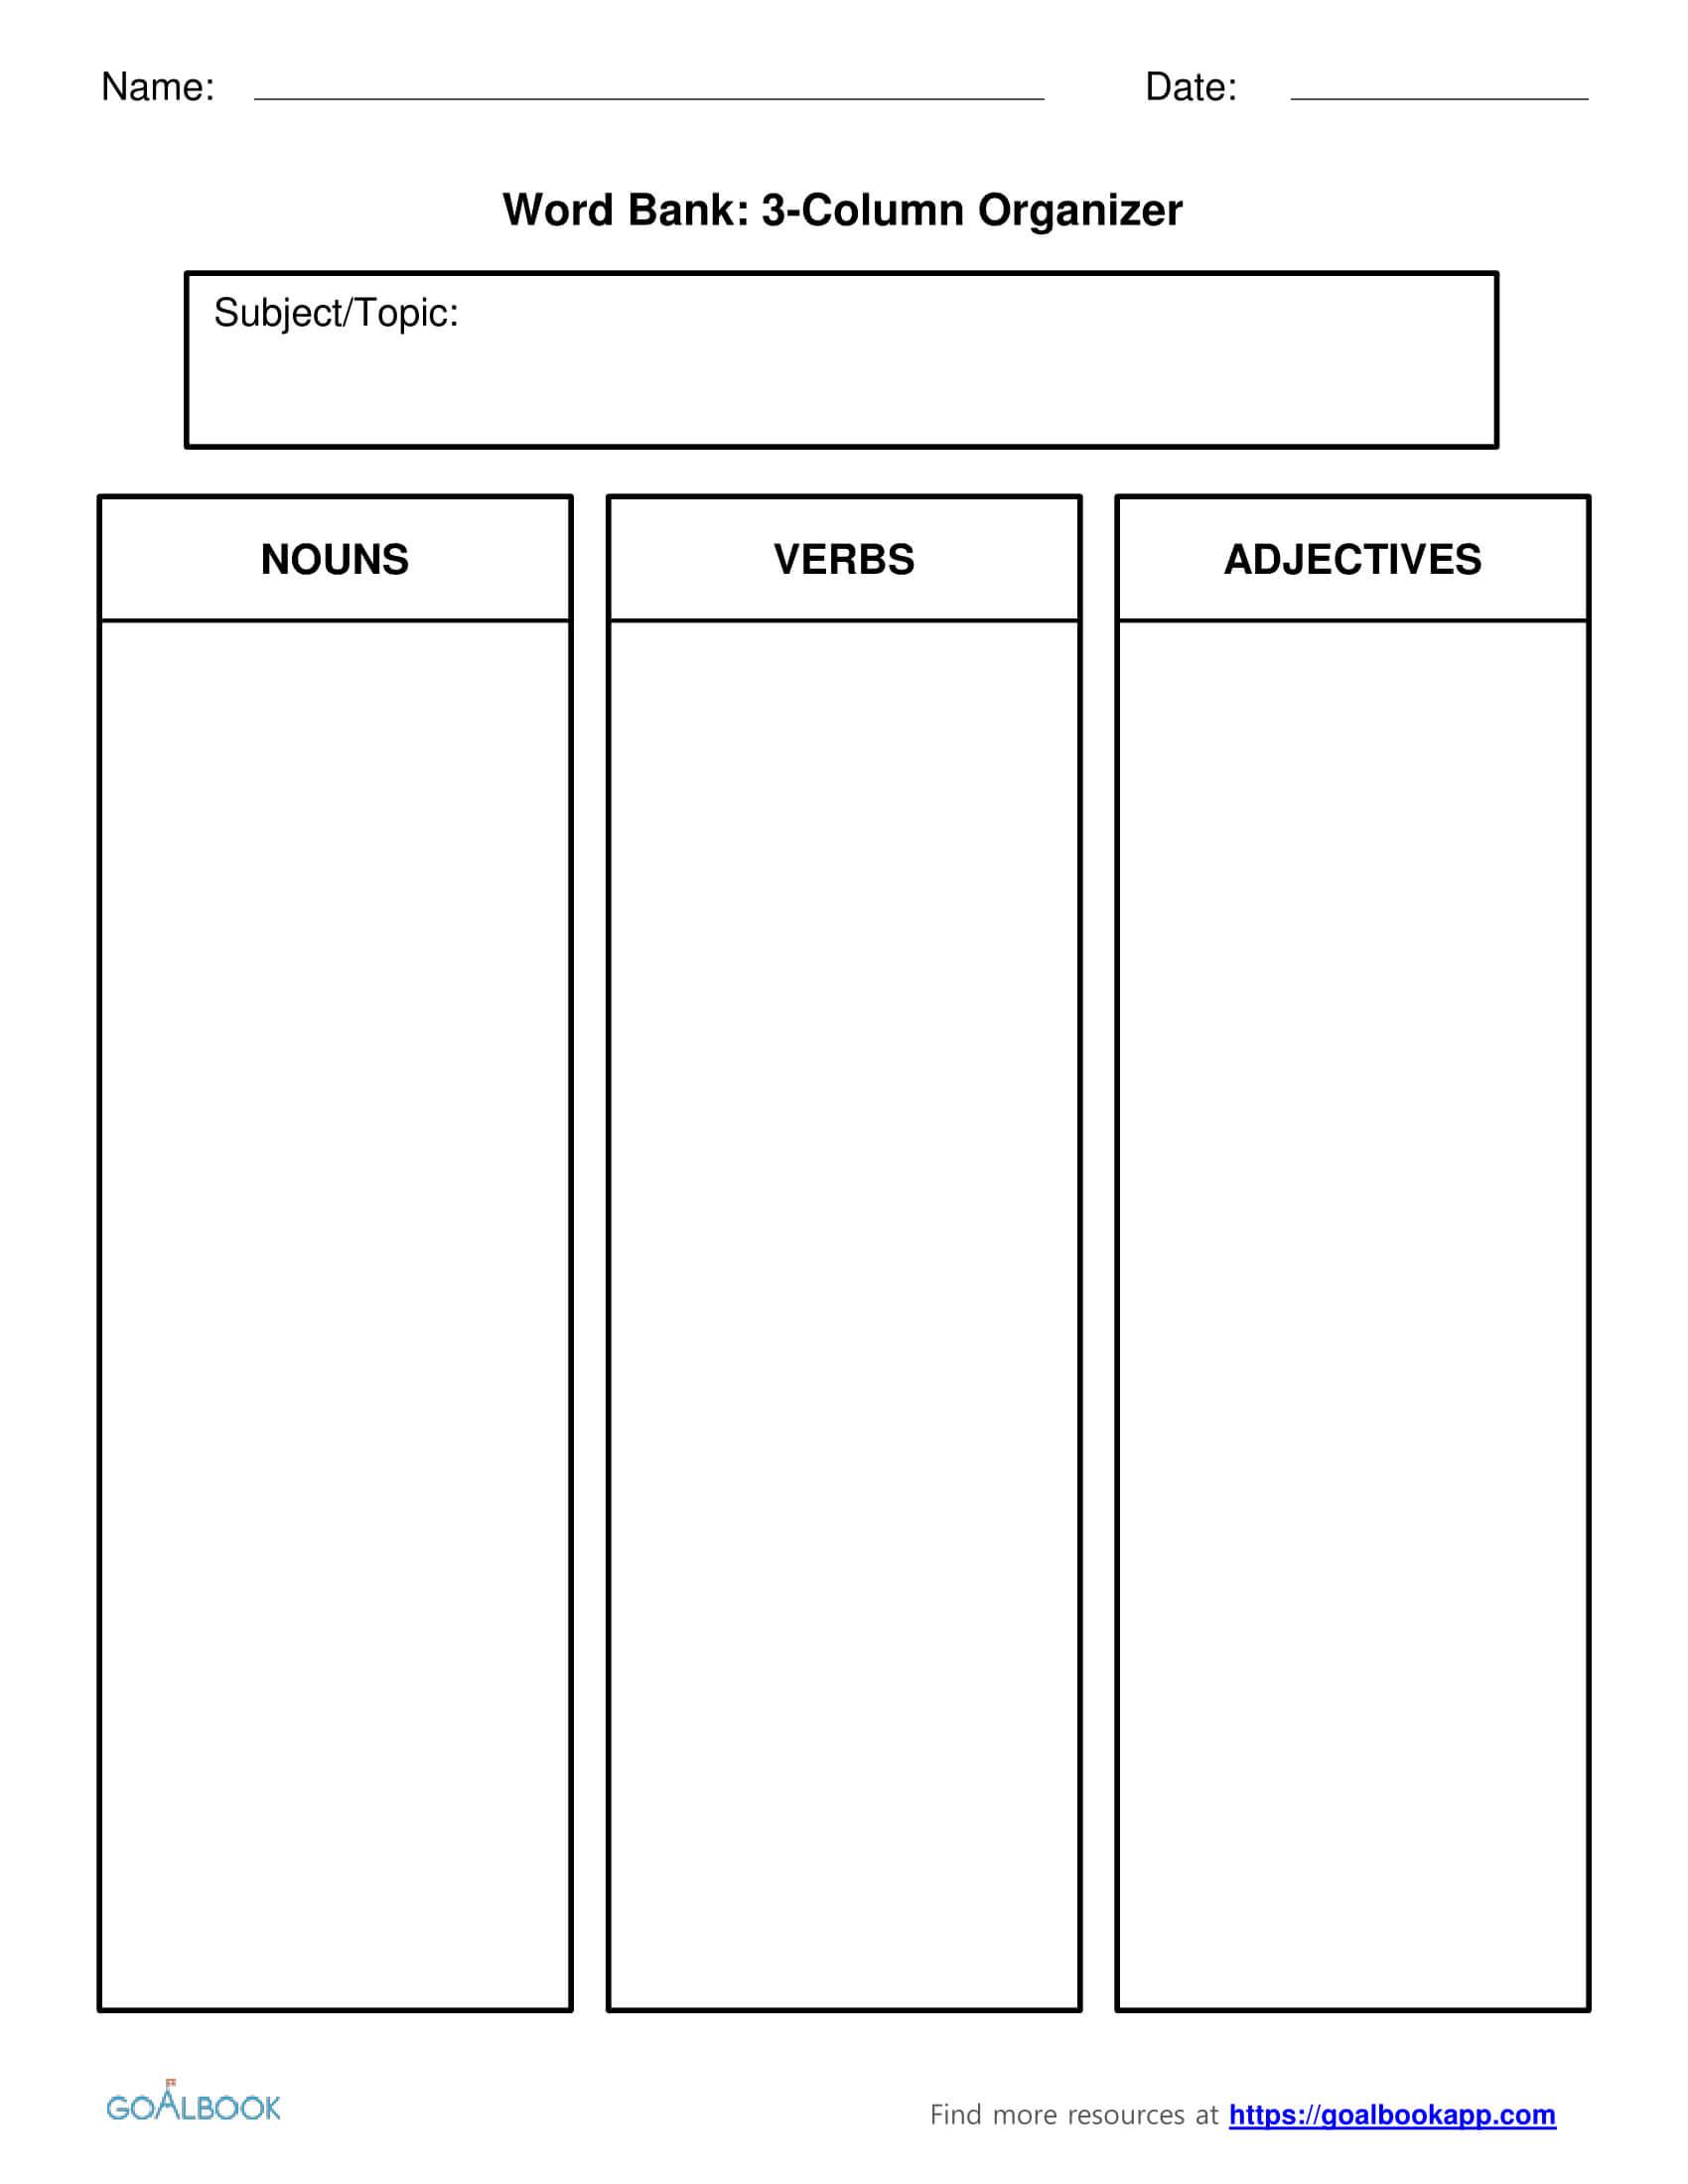 Word Bank | Udl Strategies - Goalbook Toolkit Pertaining To 3 Column Word Template